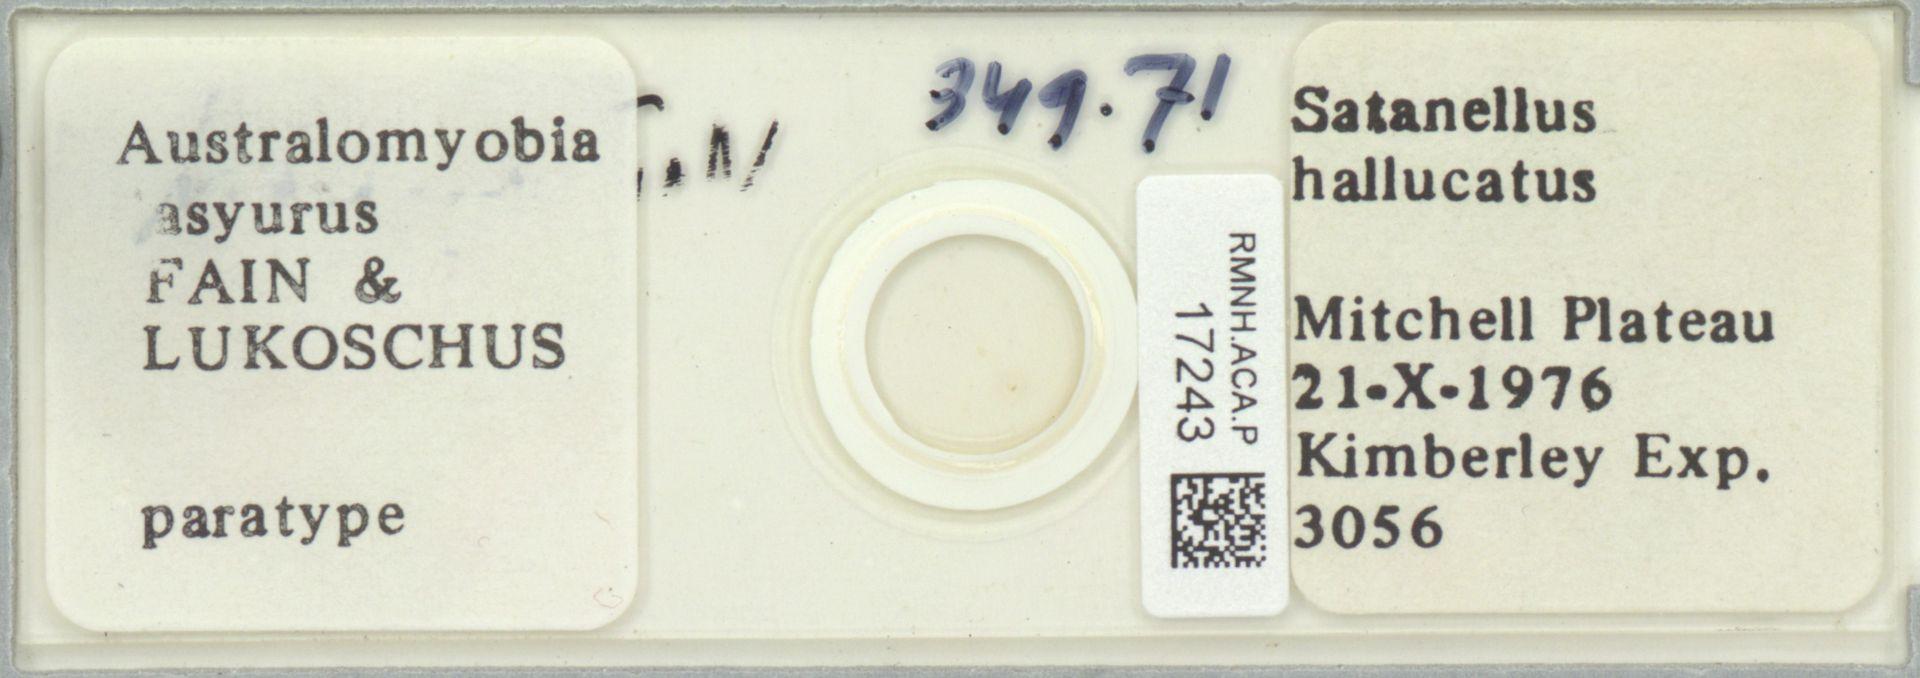 RMNH.ACA.P.17243 | Australomyobia asyurus